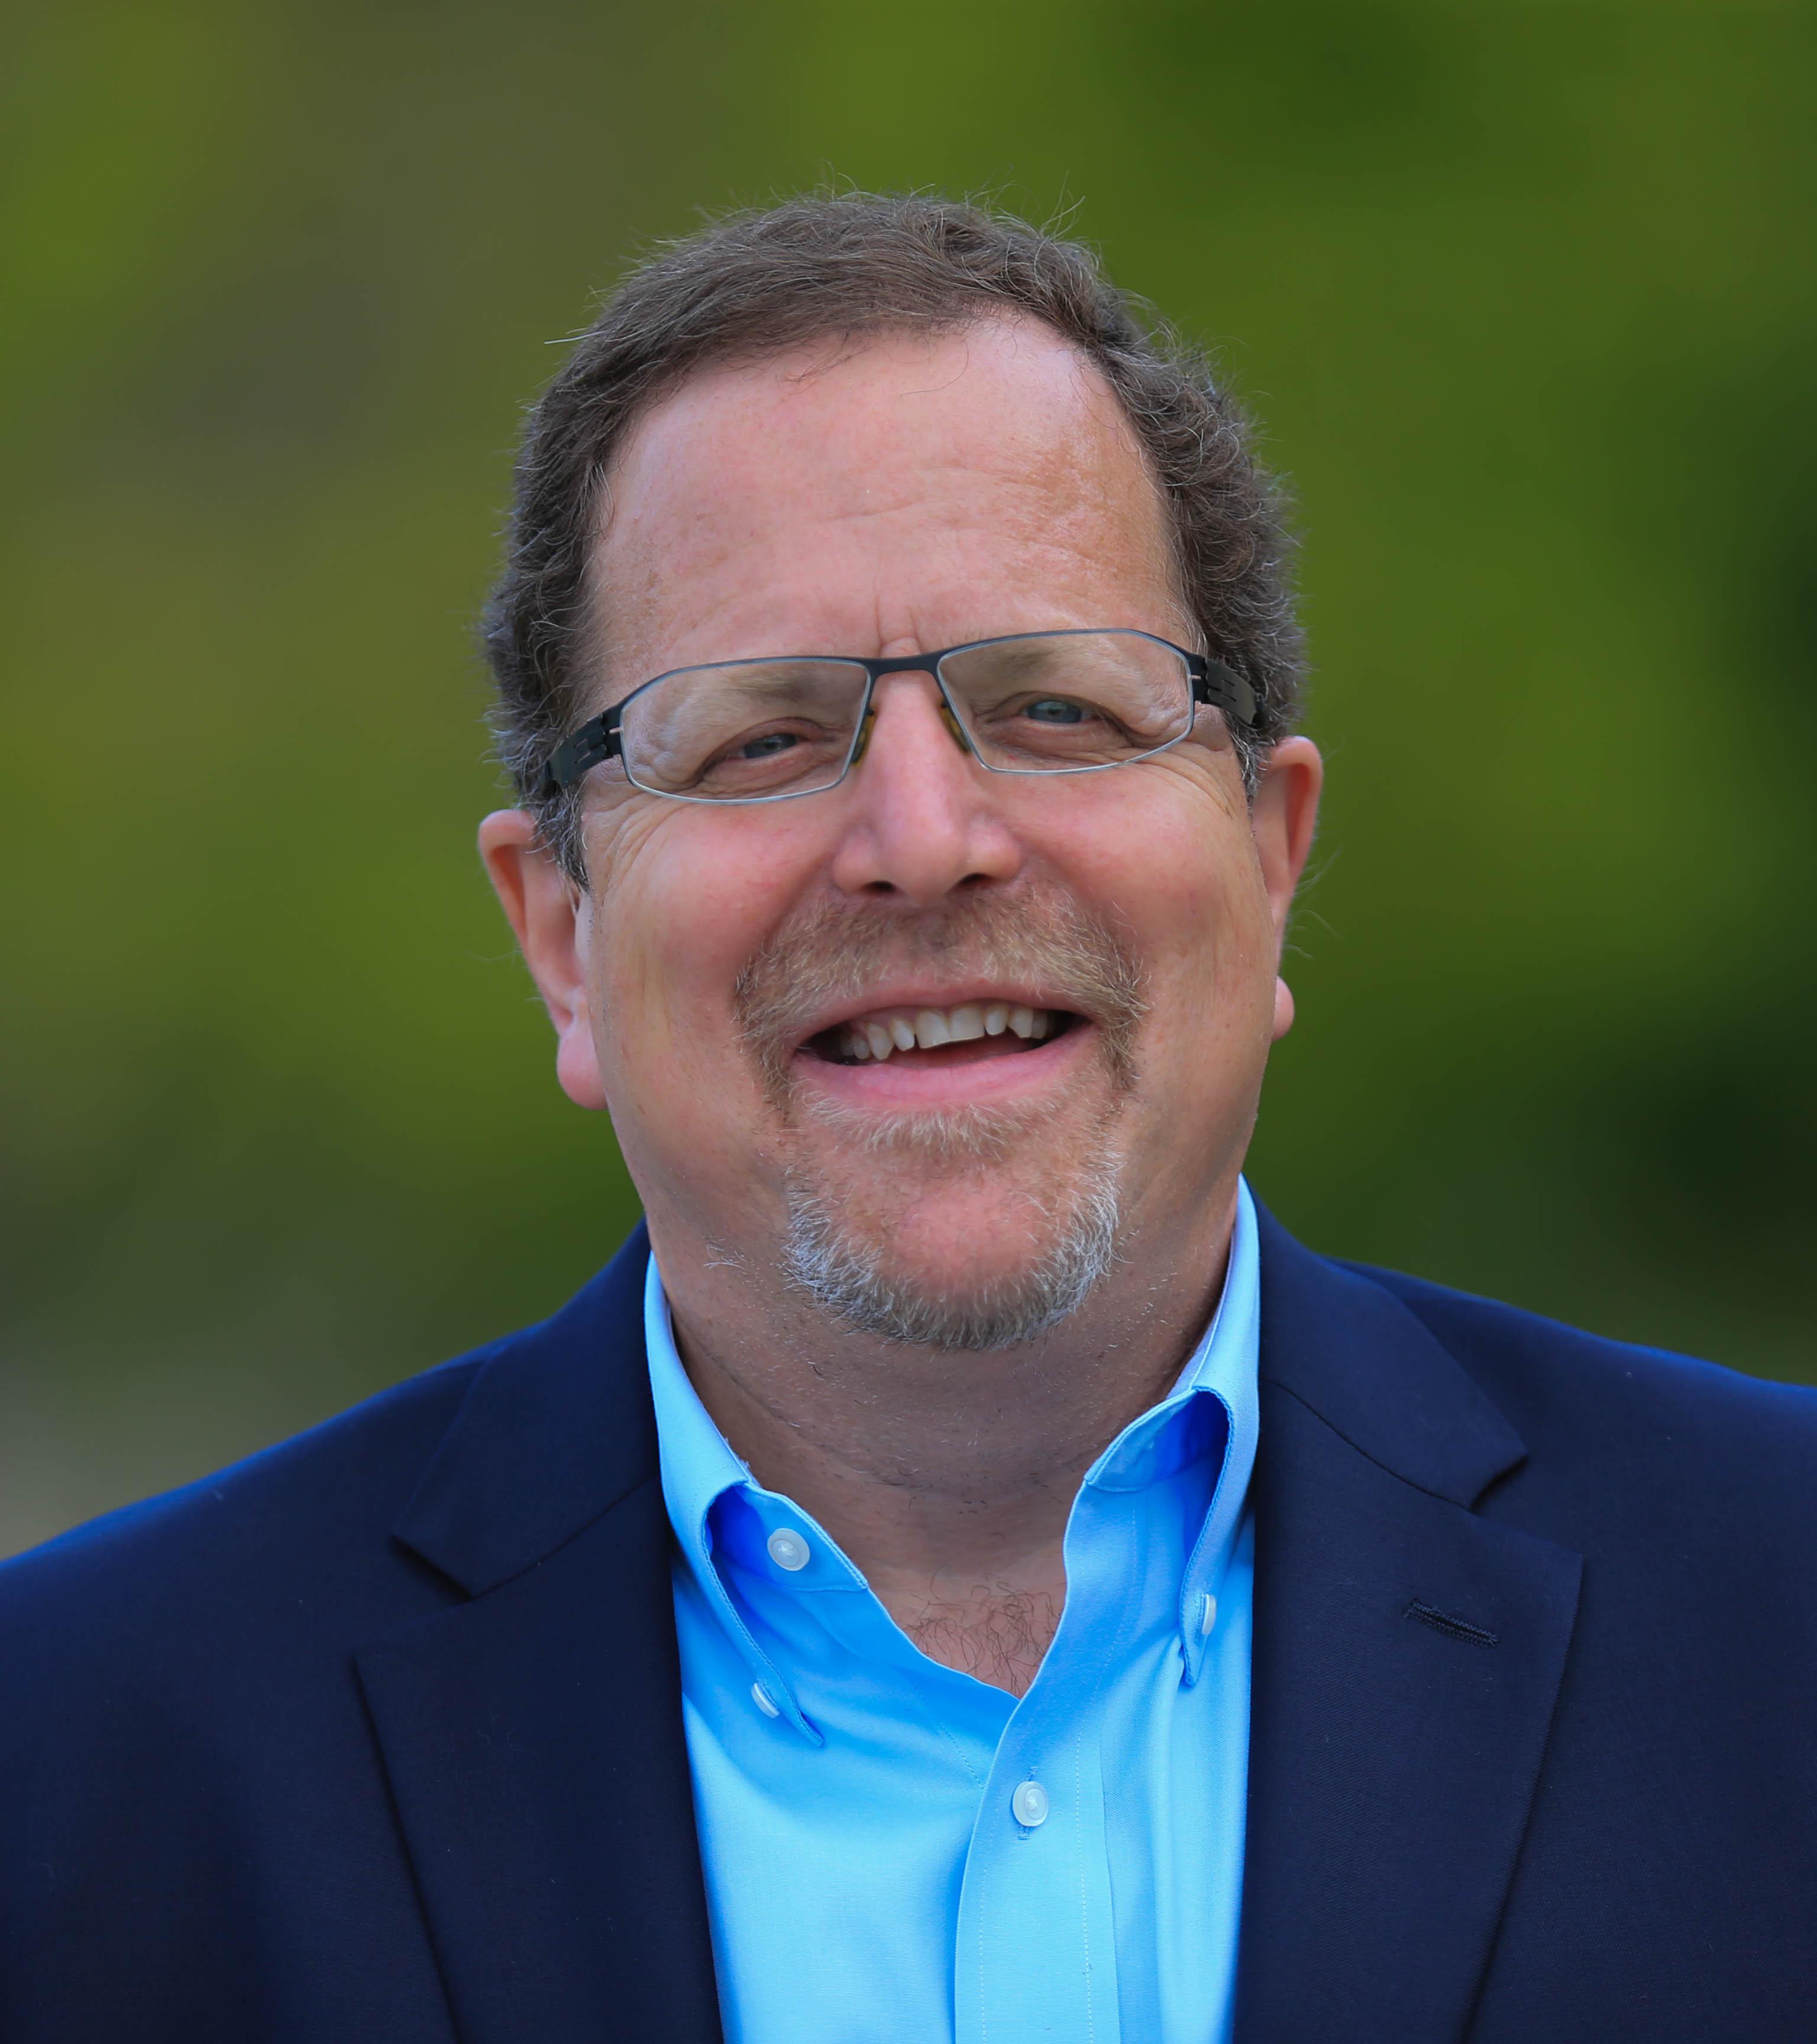 Don Goldman : Executive Director and CEO